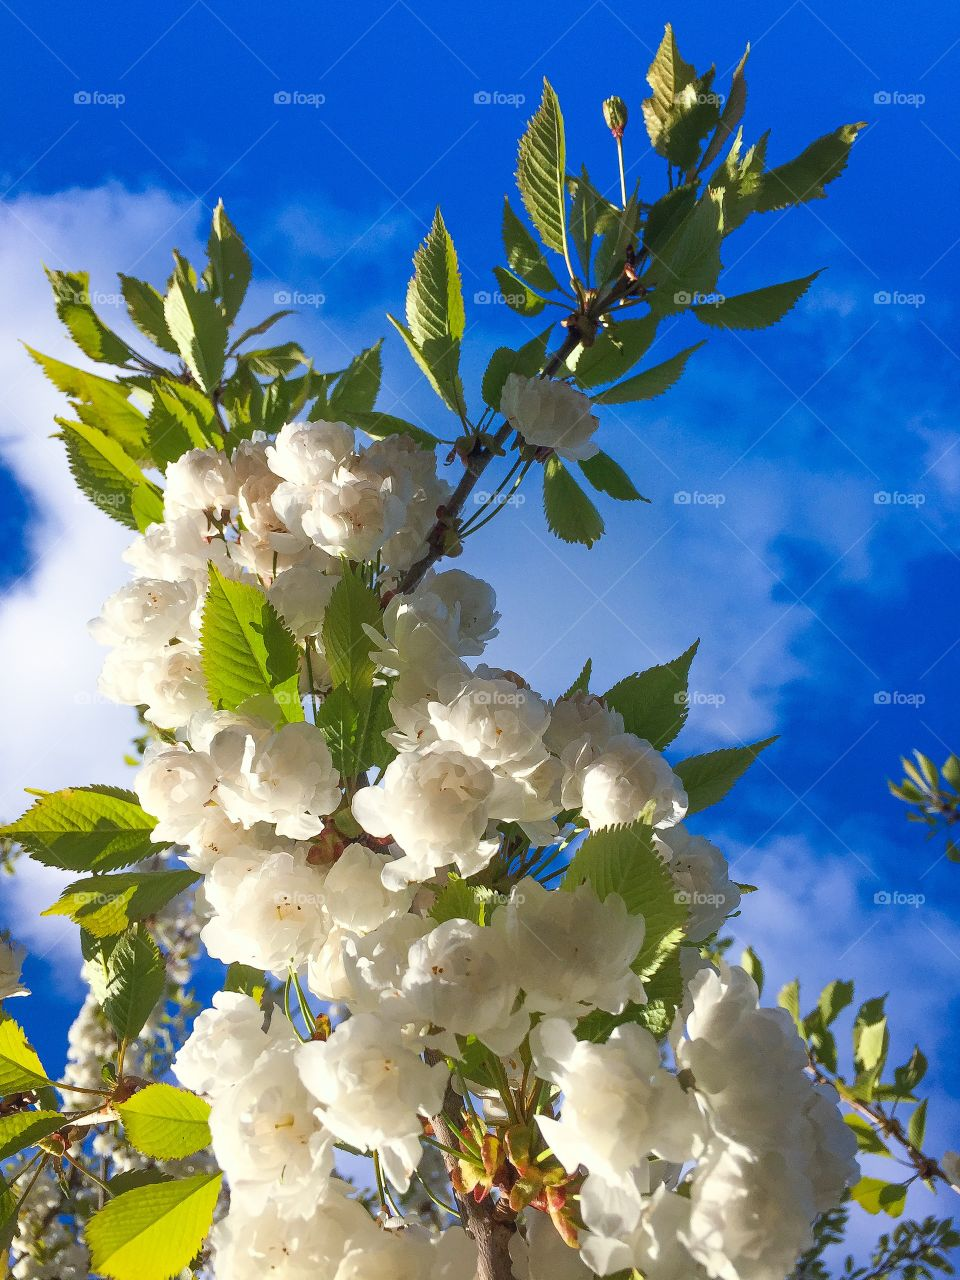 Flower in the sky. Flower in the sky